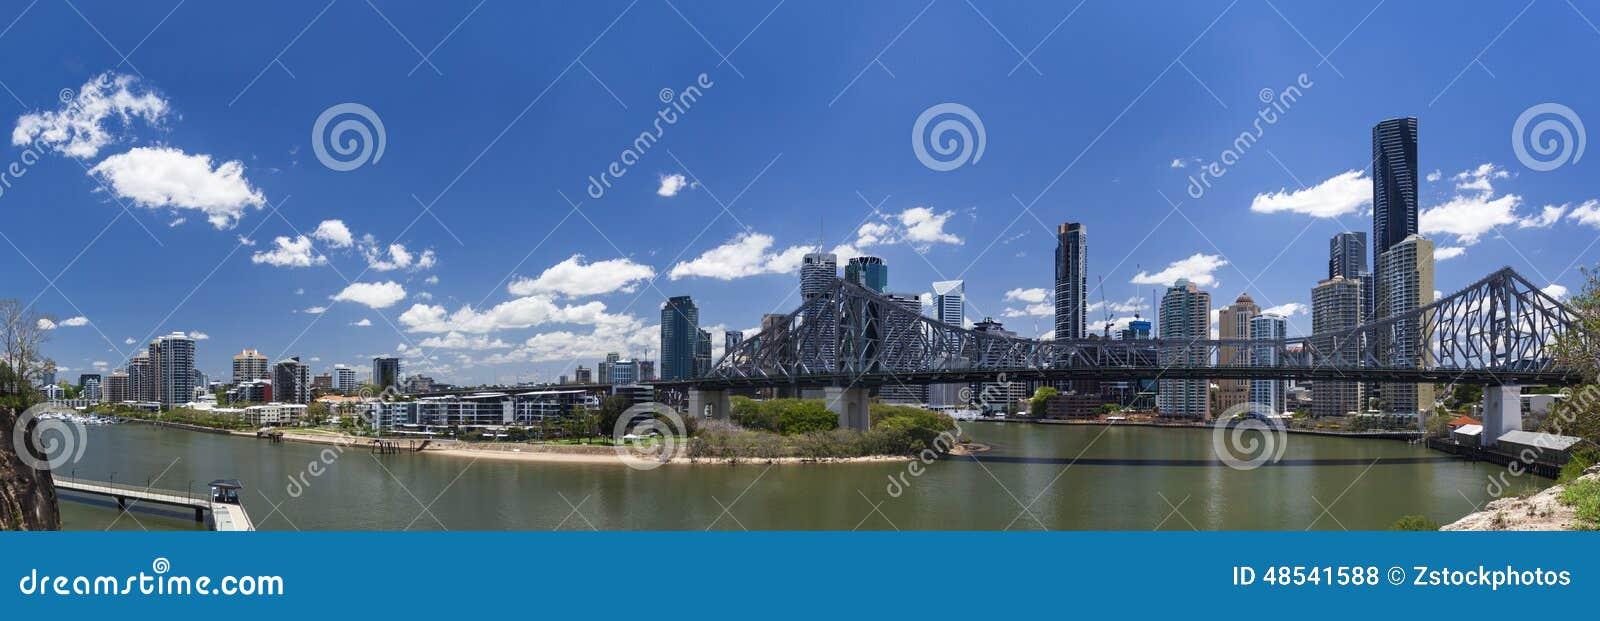 Het panorama van Brisbane